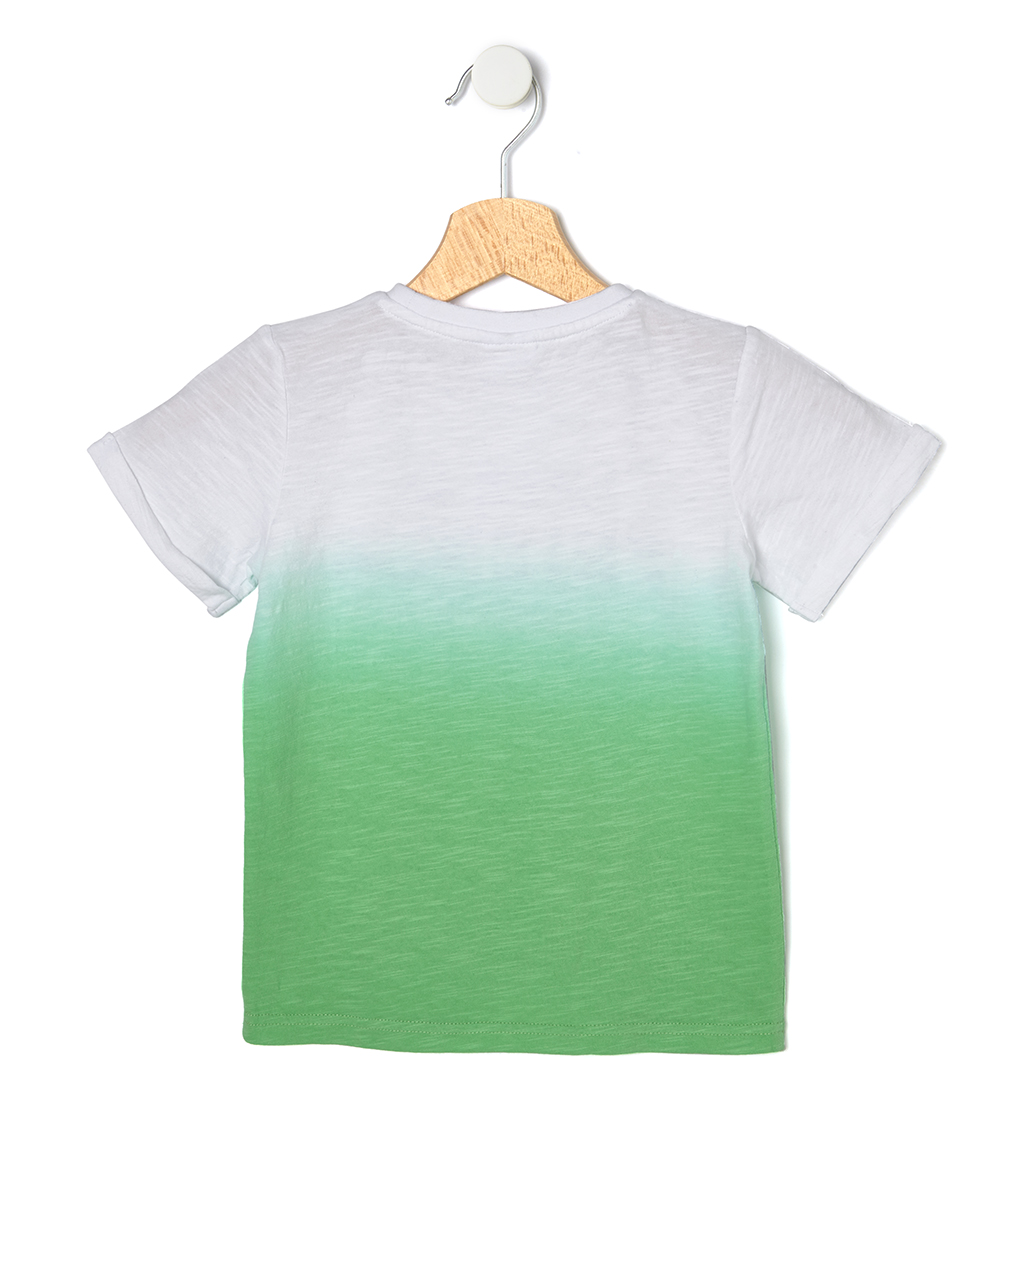 T-shirt in jersey con stampa coccodrillo - Prénatal